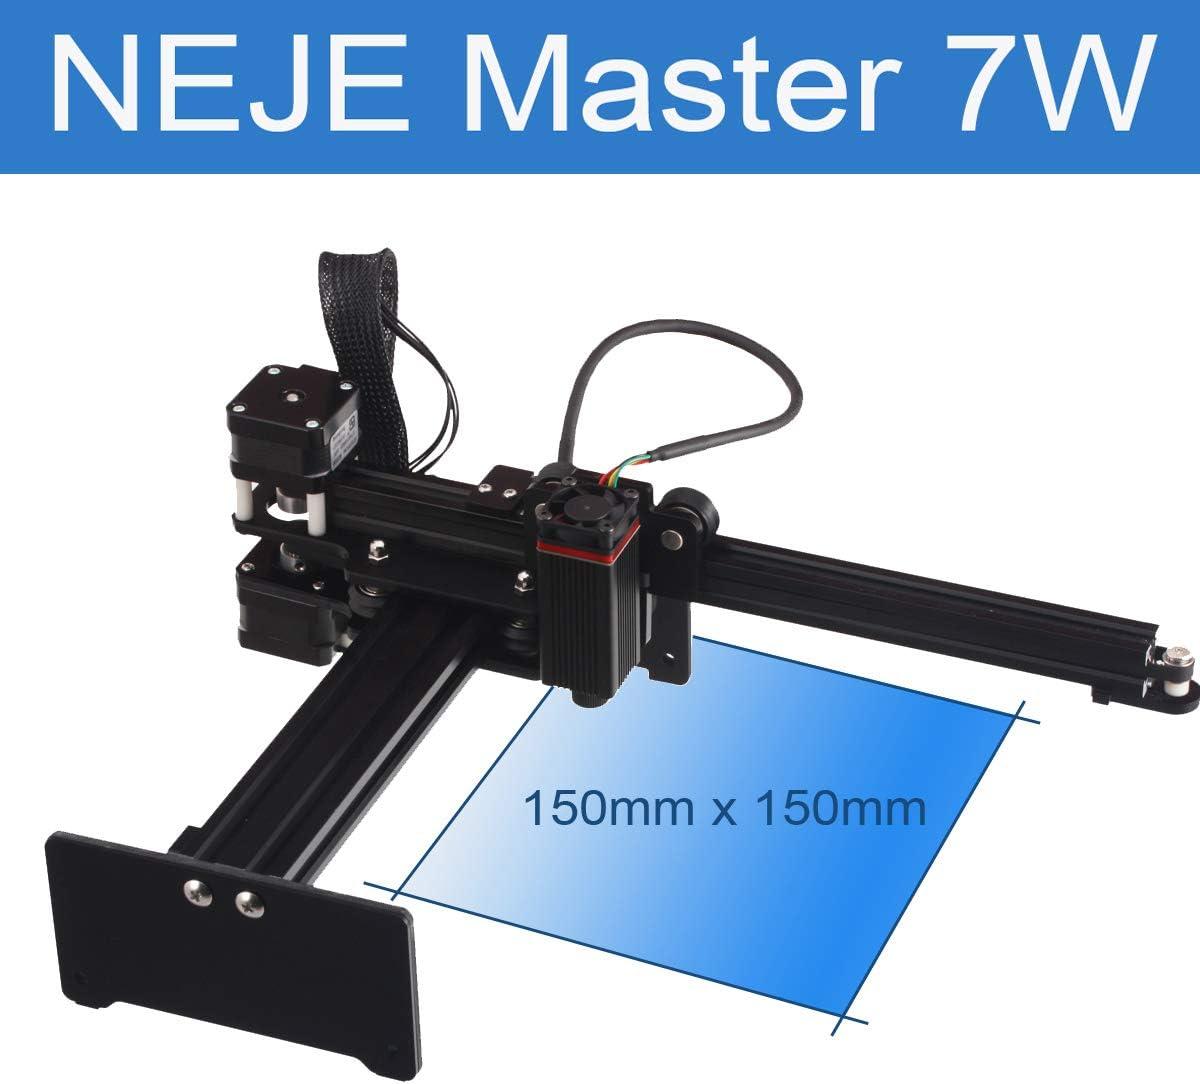 NEJE Master 7000mW Laser Cutter Desktop CNC Laser Engraving Machine Mini Carver Laser Engraver Cutter DIY Logo Marker Printer APP Control for Windows, Mac, Android, Wood Cutting,Large Working Area